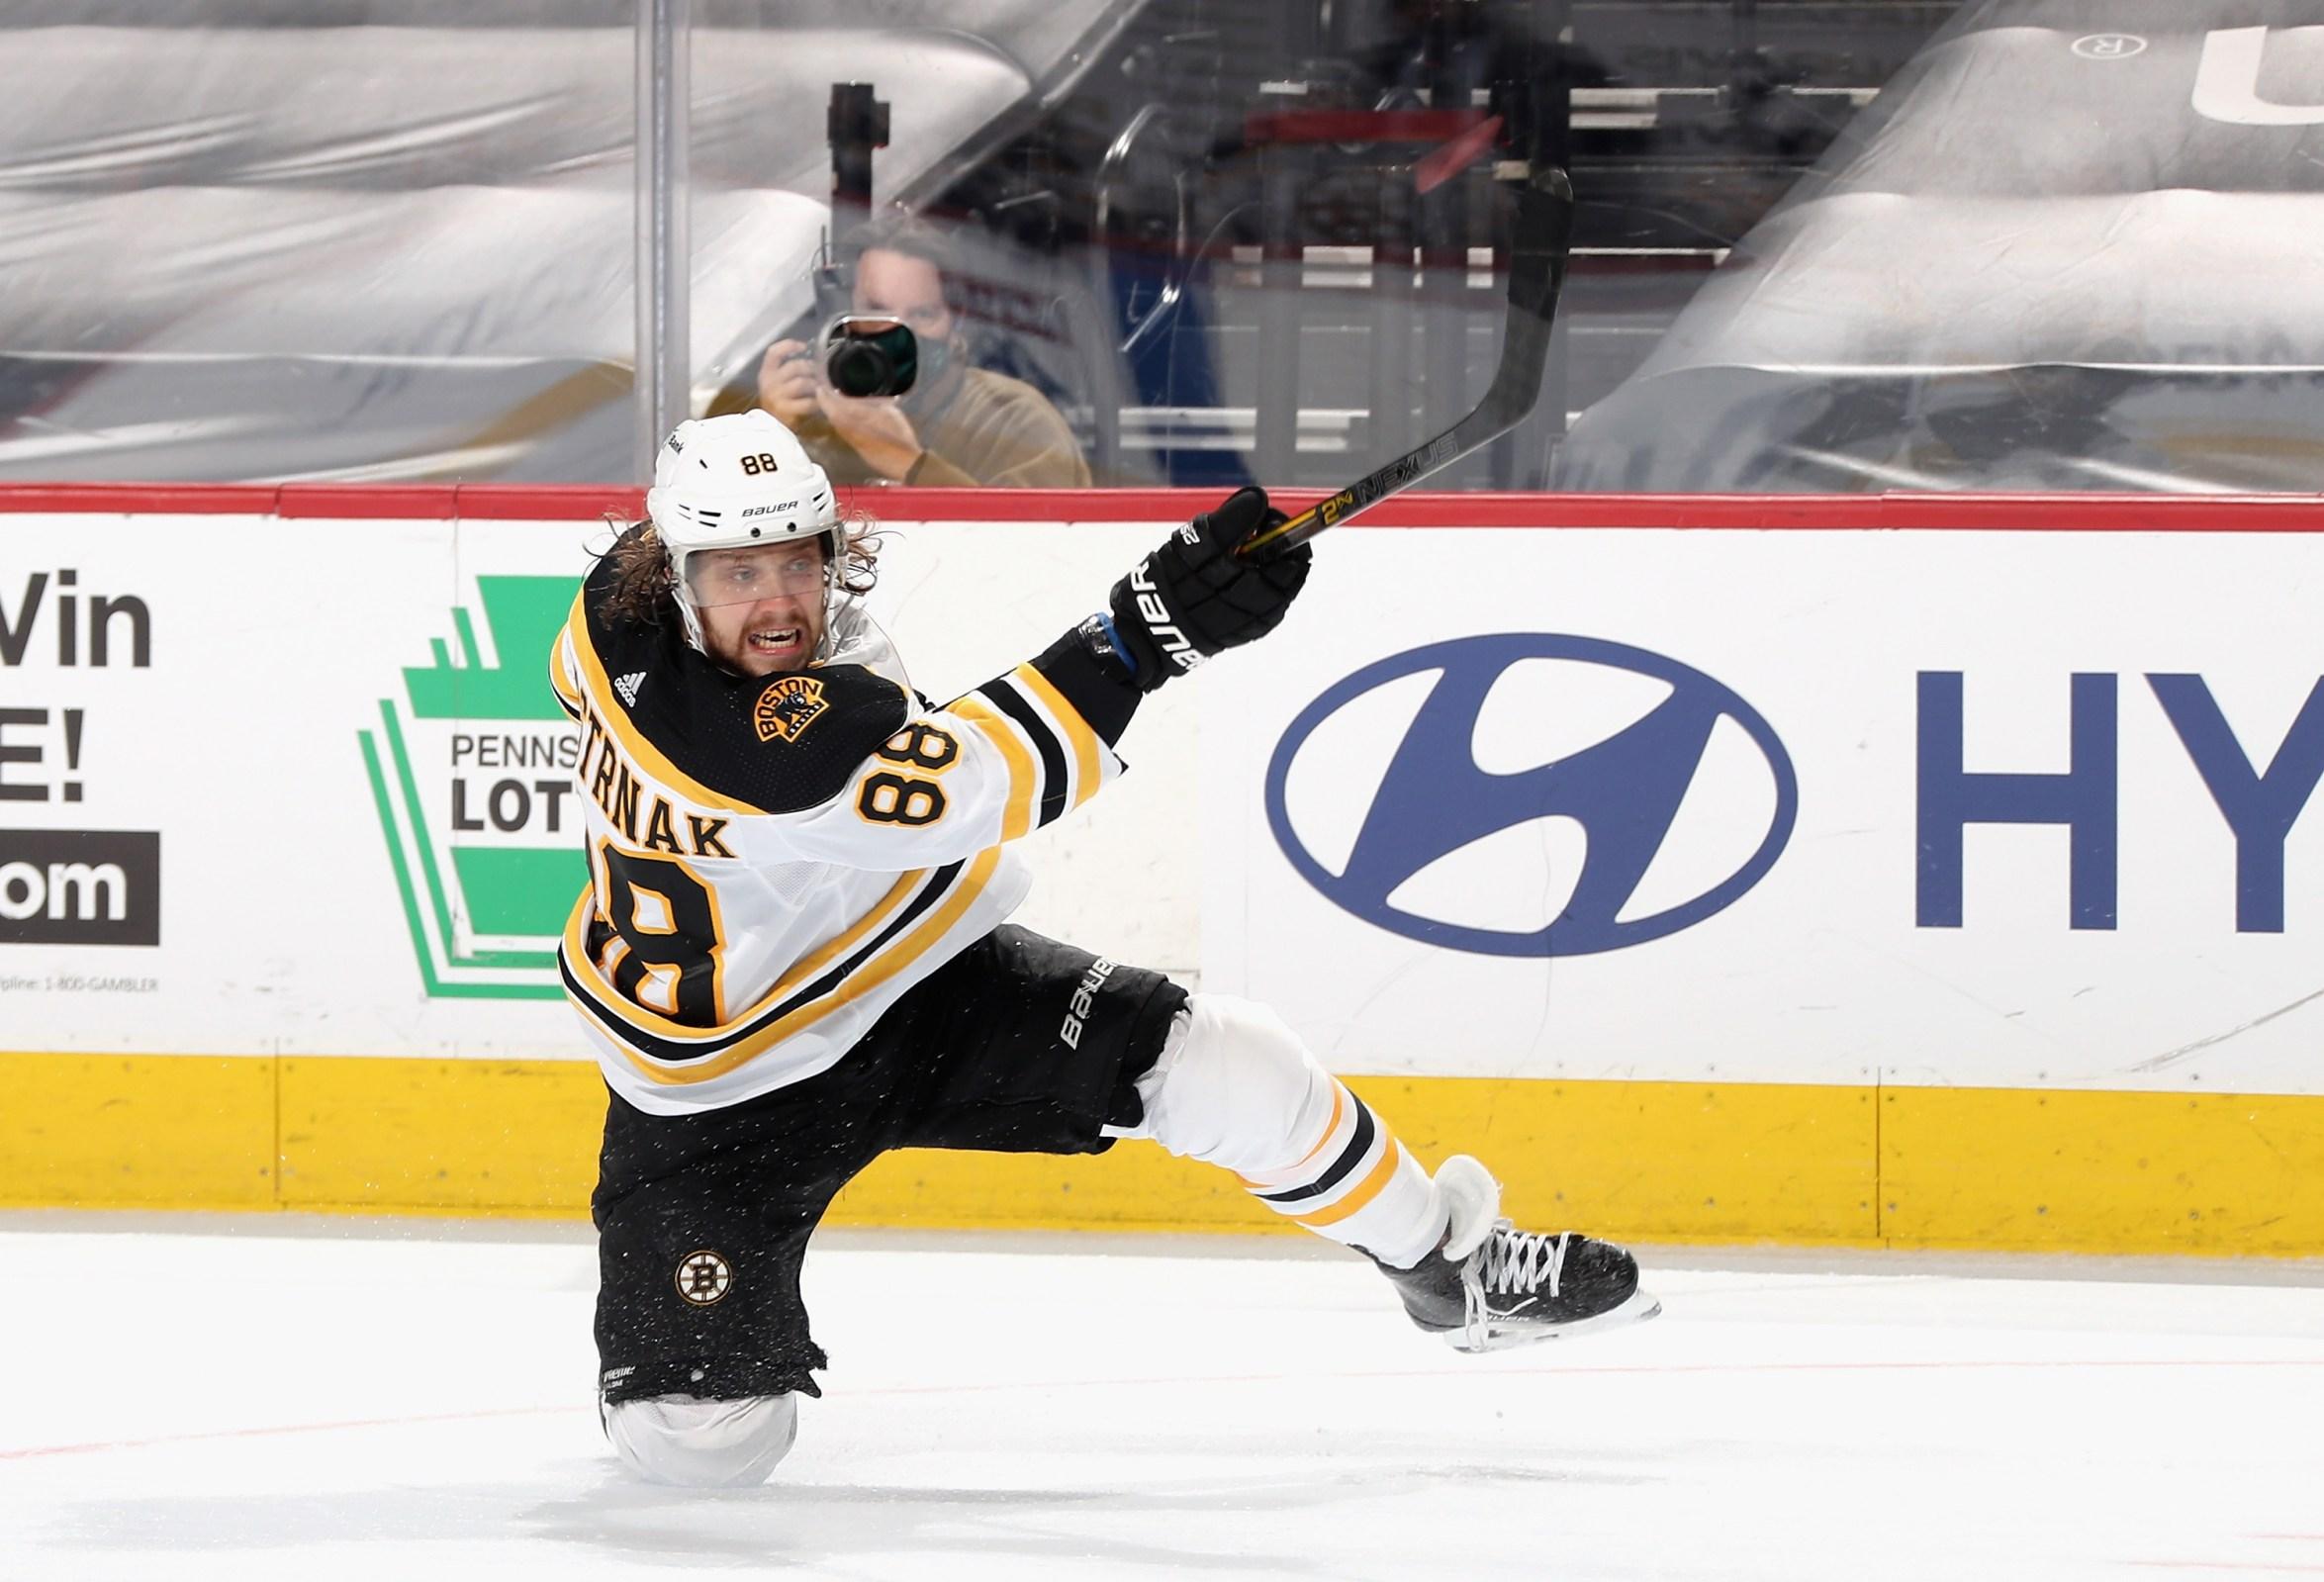 David Pastrnak #88 of the Boston Bruins takes a slapshot